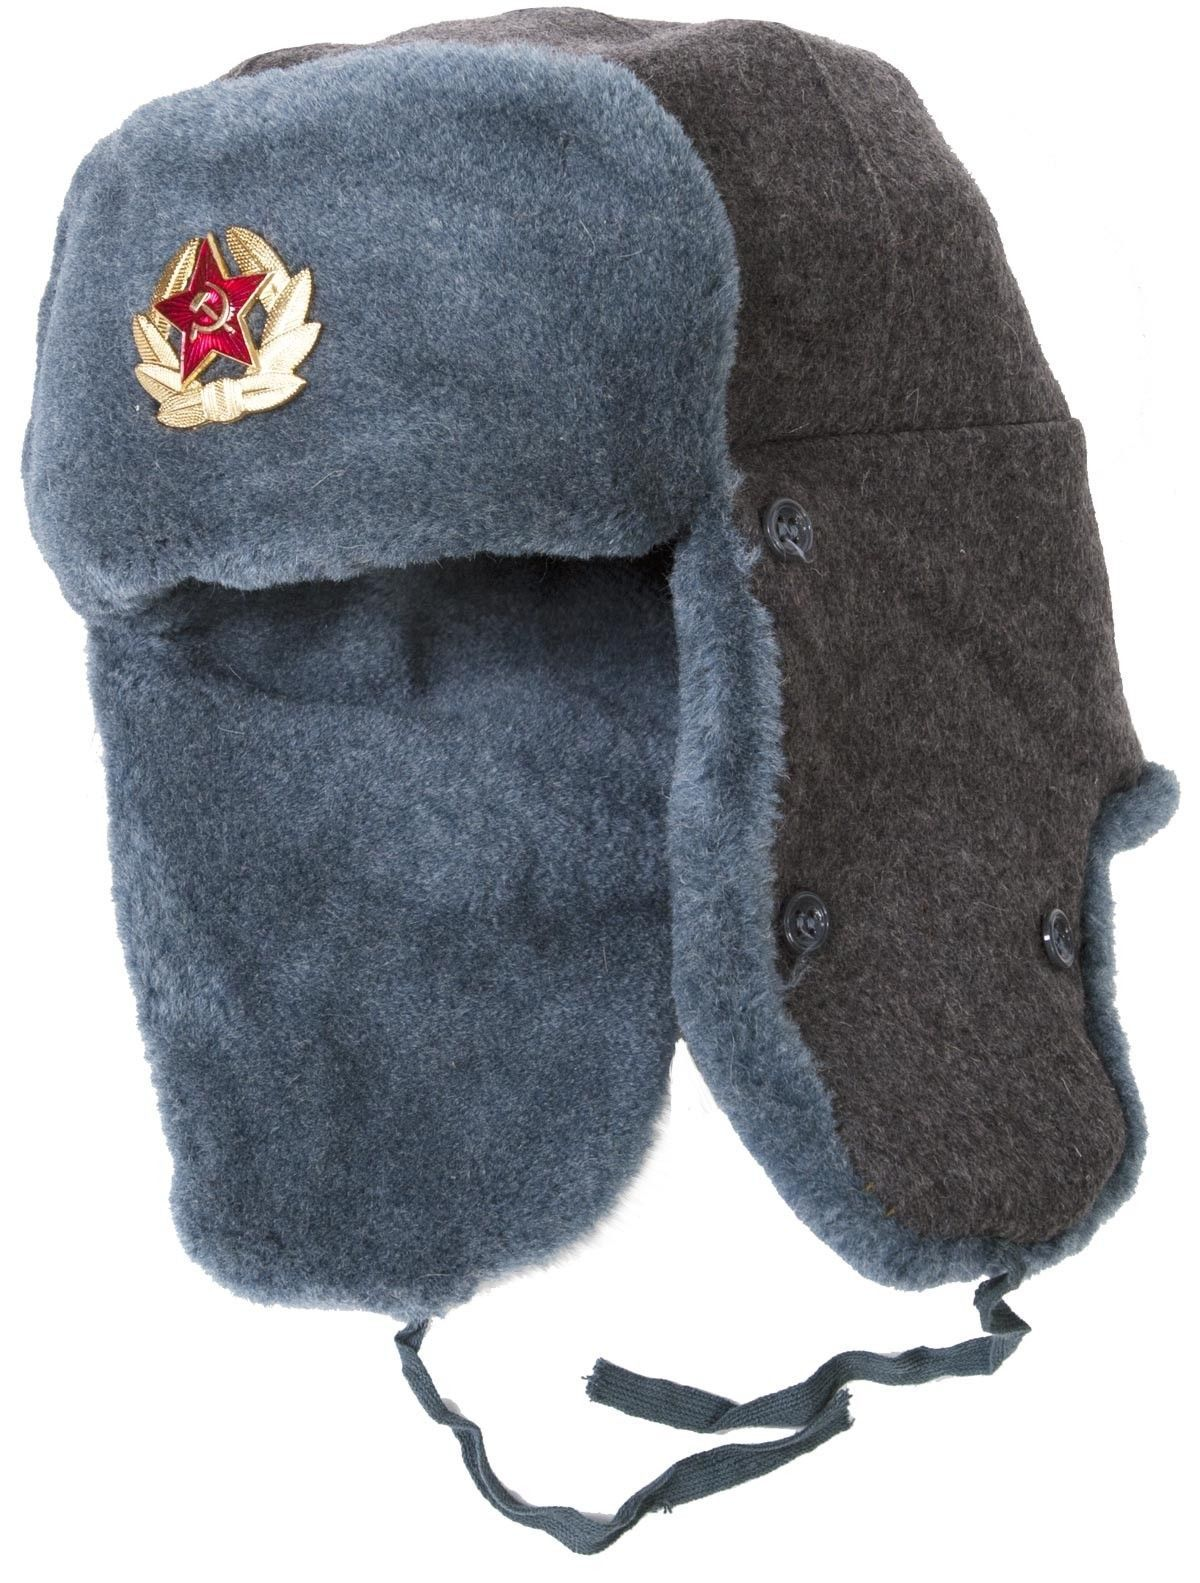 dd2f7856 Vintage Soviet BOMBER WWII Ushanka Army Soviet military original warm winter  trapper hat